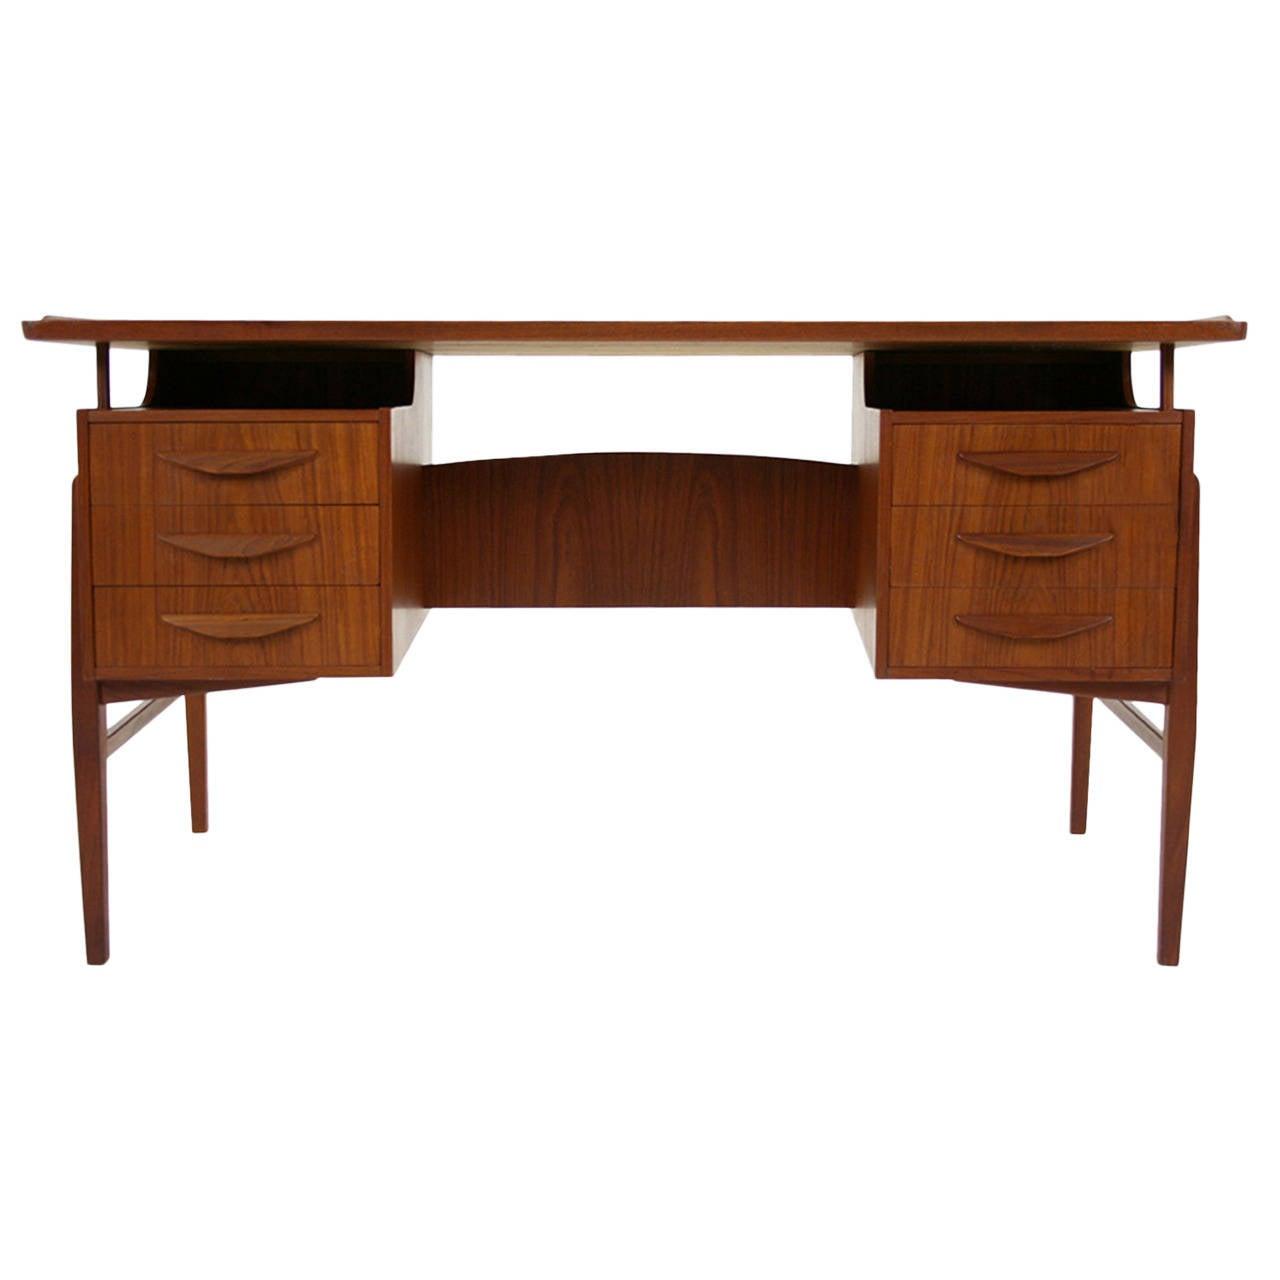 Danish mid century modern teak writing desk work table office desk at 1stdibs - Vancouver mid century modern furniture ...